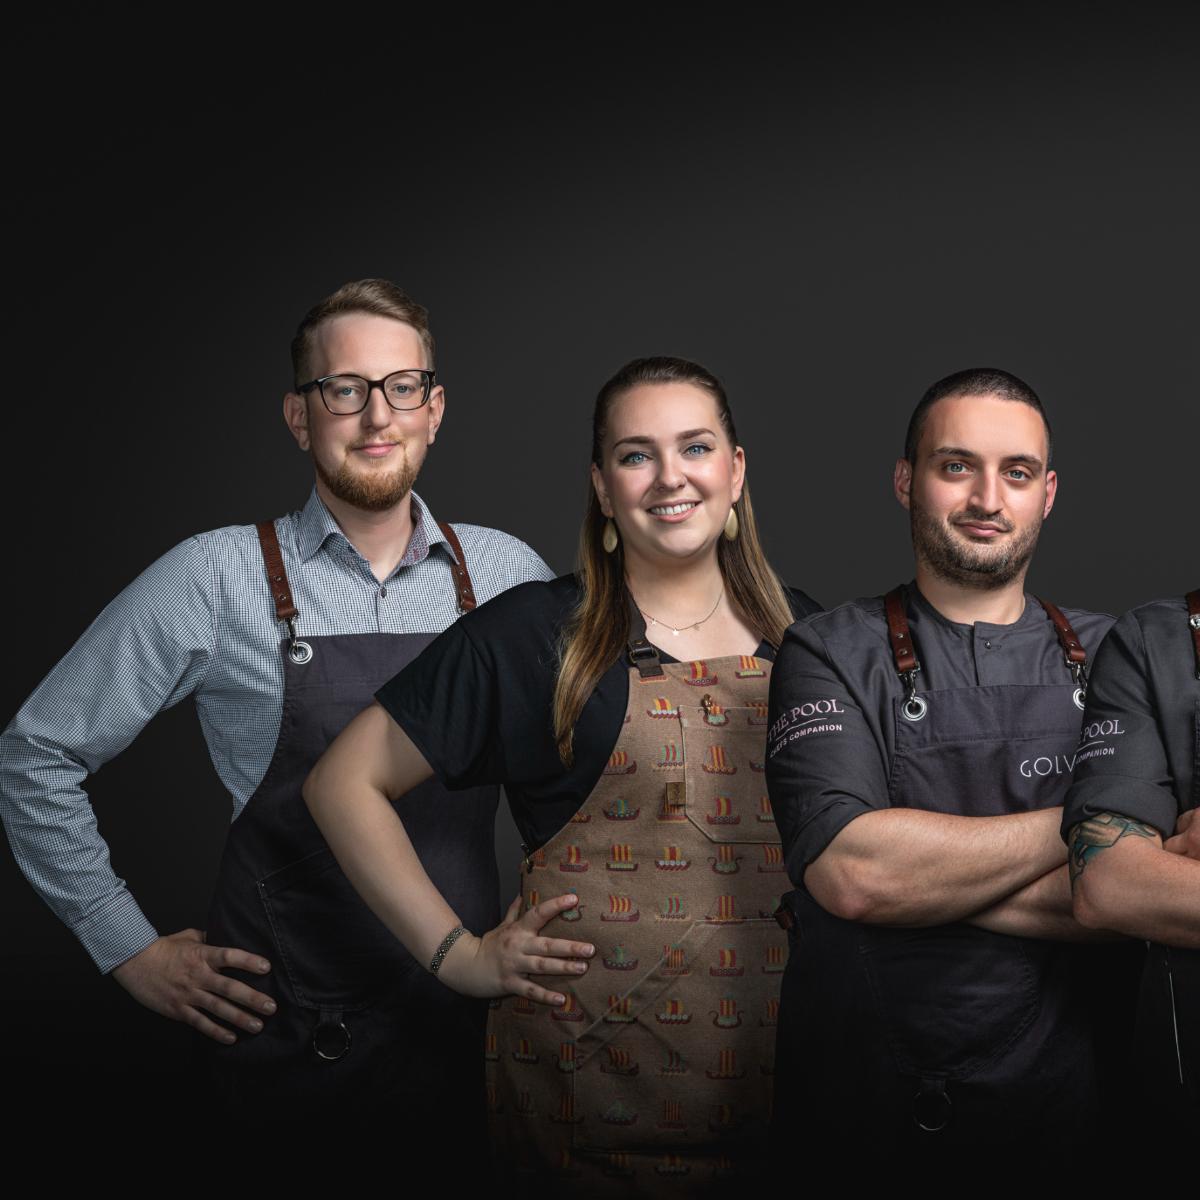 Team Restaurant Golvet Berlin